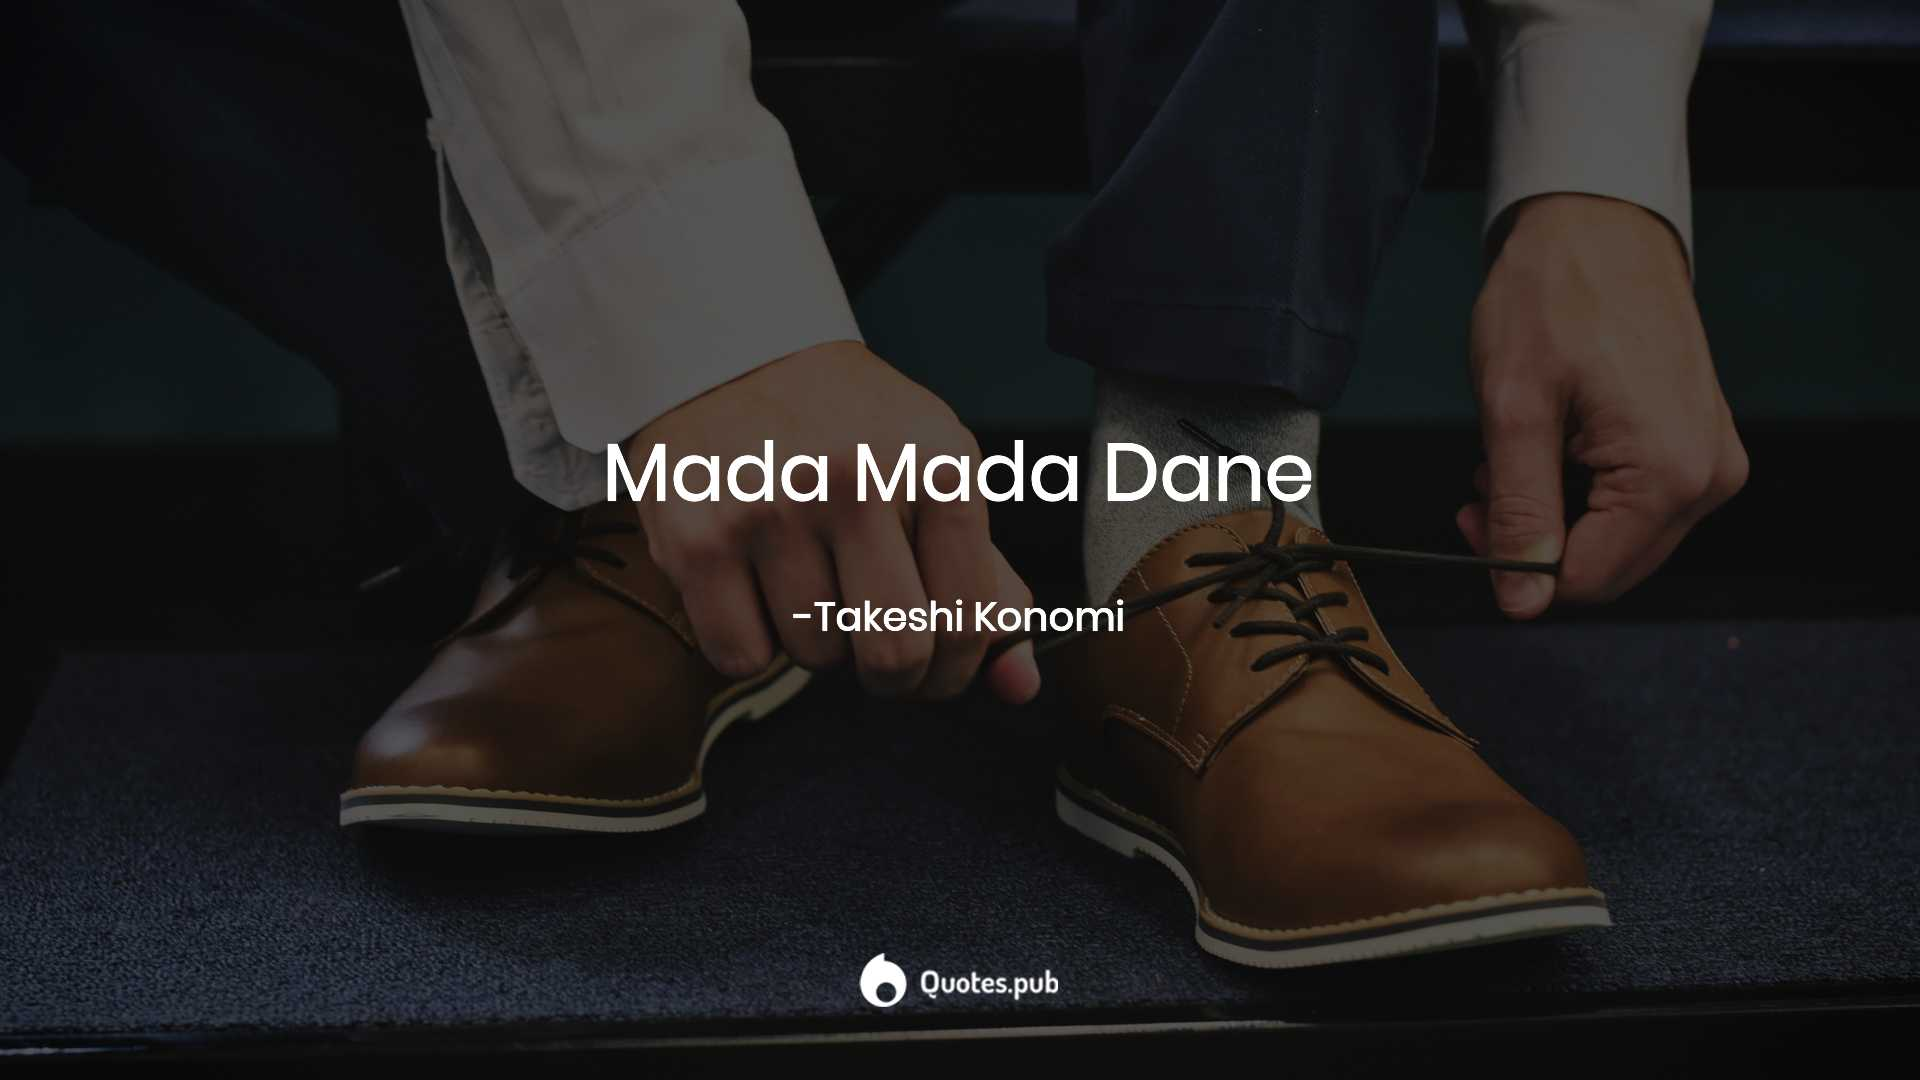 Mada Mada Dane Takeshi Konomi Quotes Pub Prince of tennis wallpapers main color: mada mada dane takeshi konomi